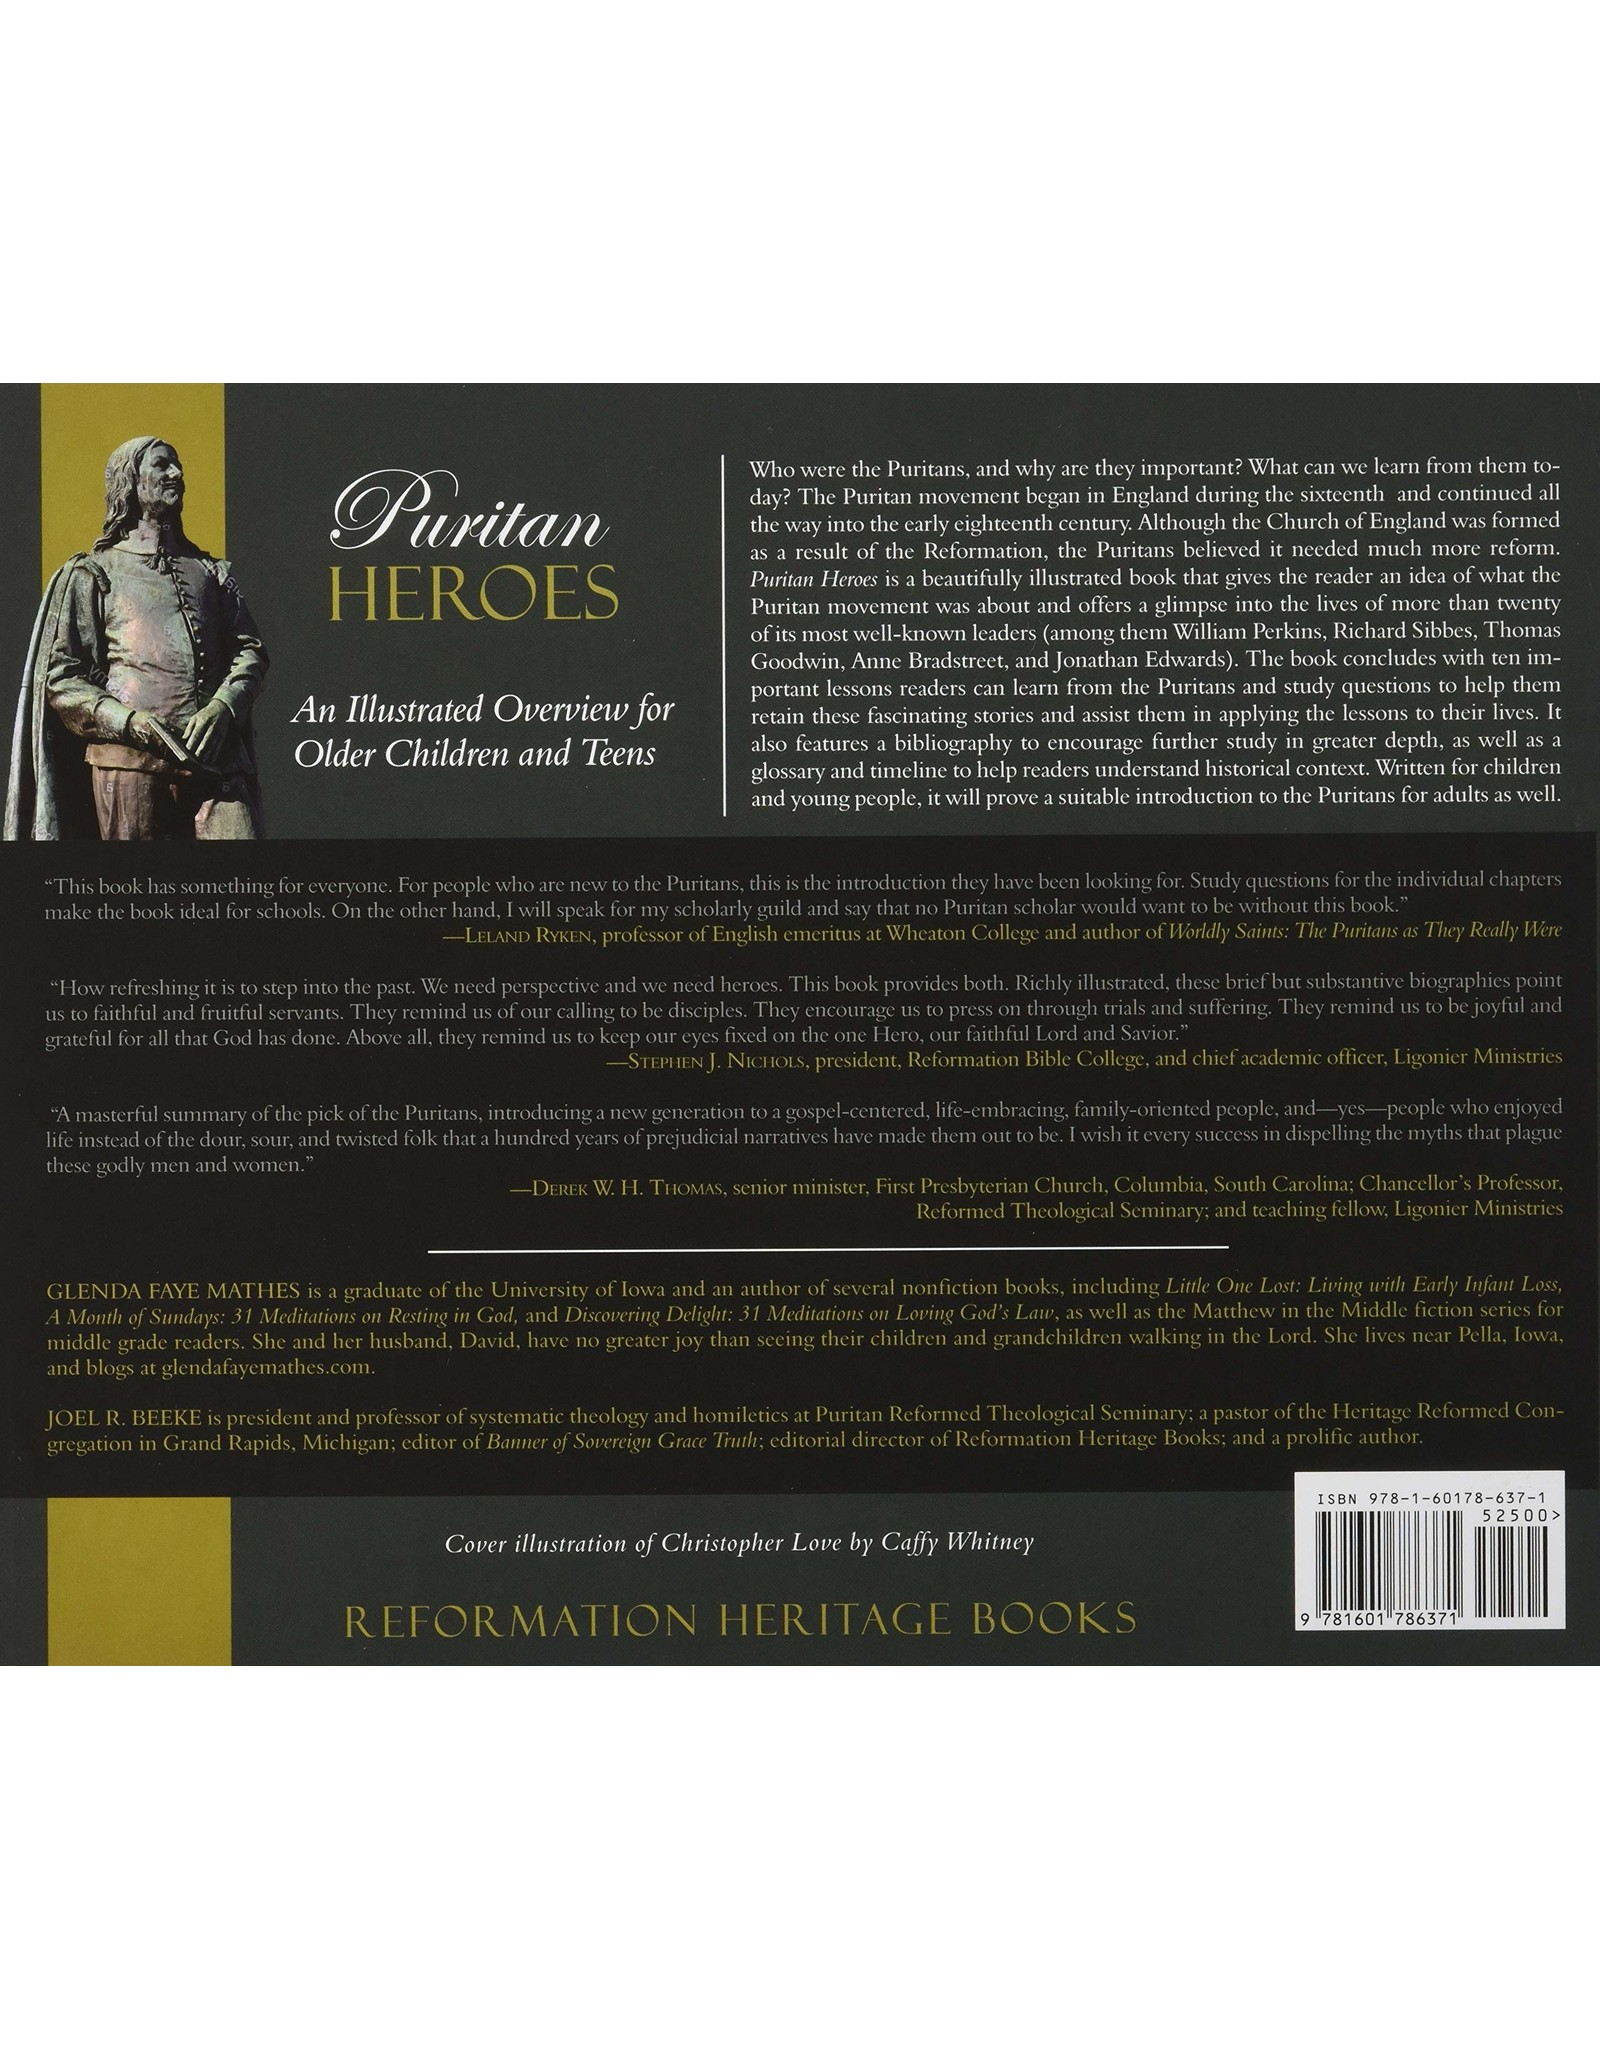 Reformation Heritage Books (RHB) Puritan Heroes